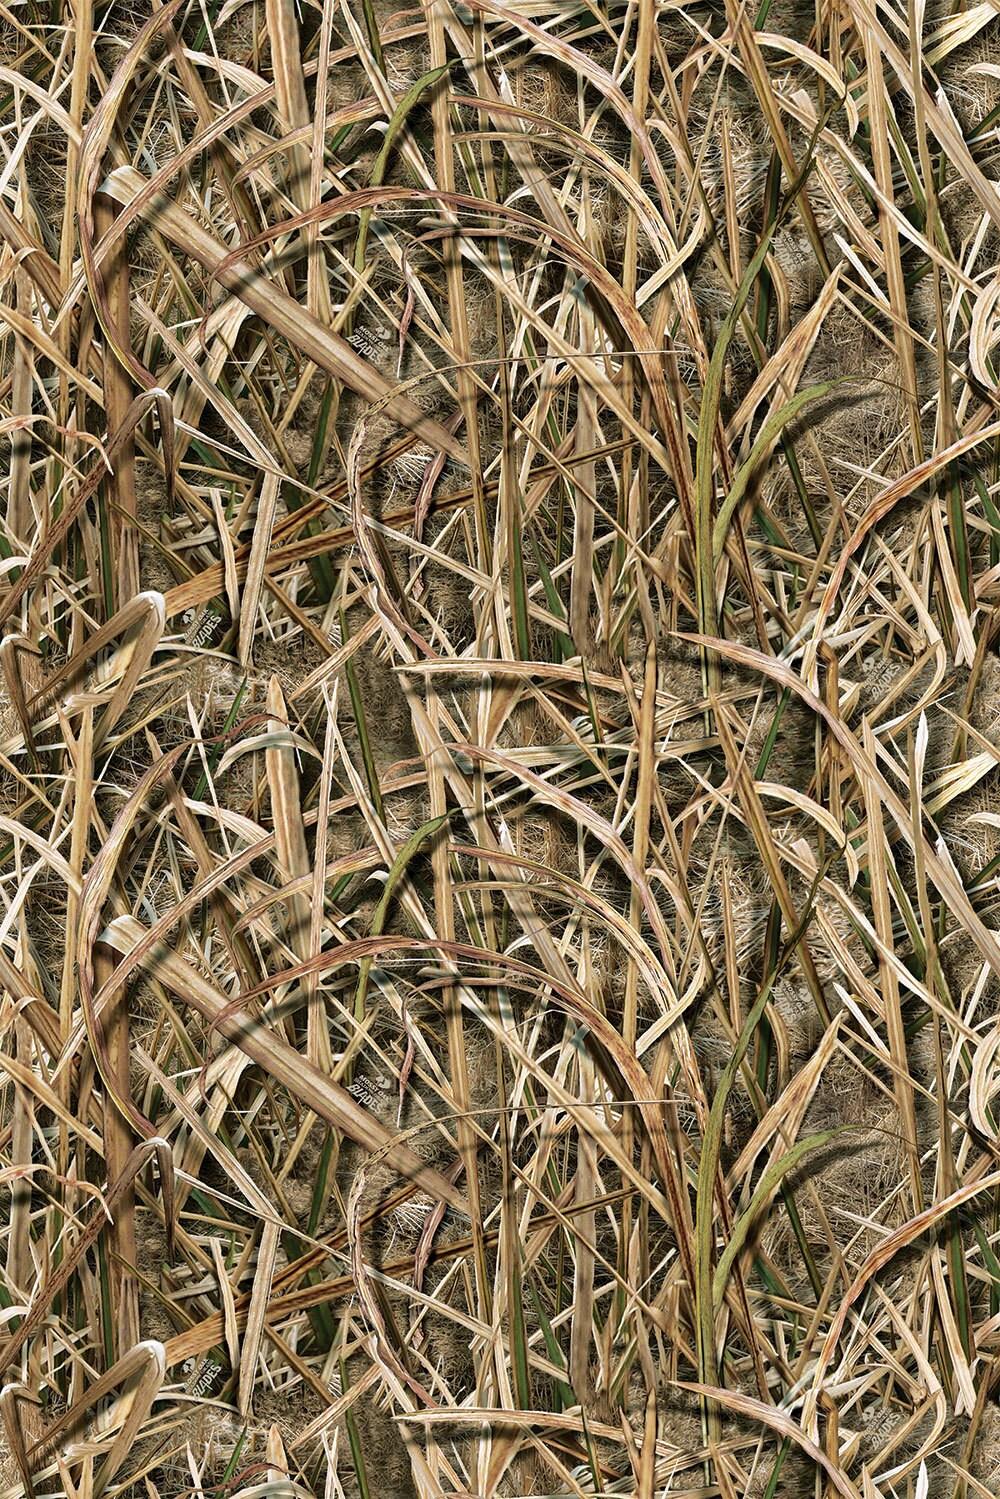 Mossy Oak Shadow Grass Blades Camo Vinyl Roll Outdoor